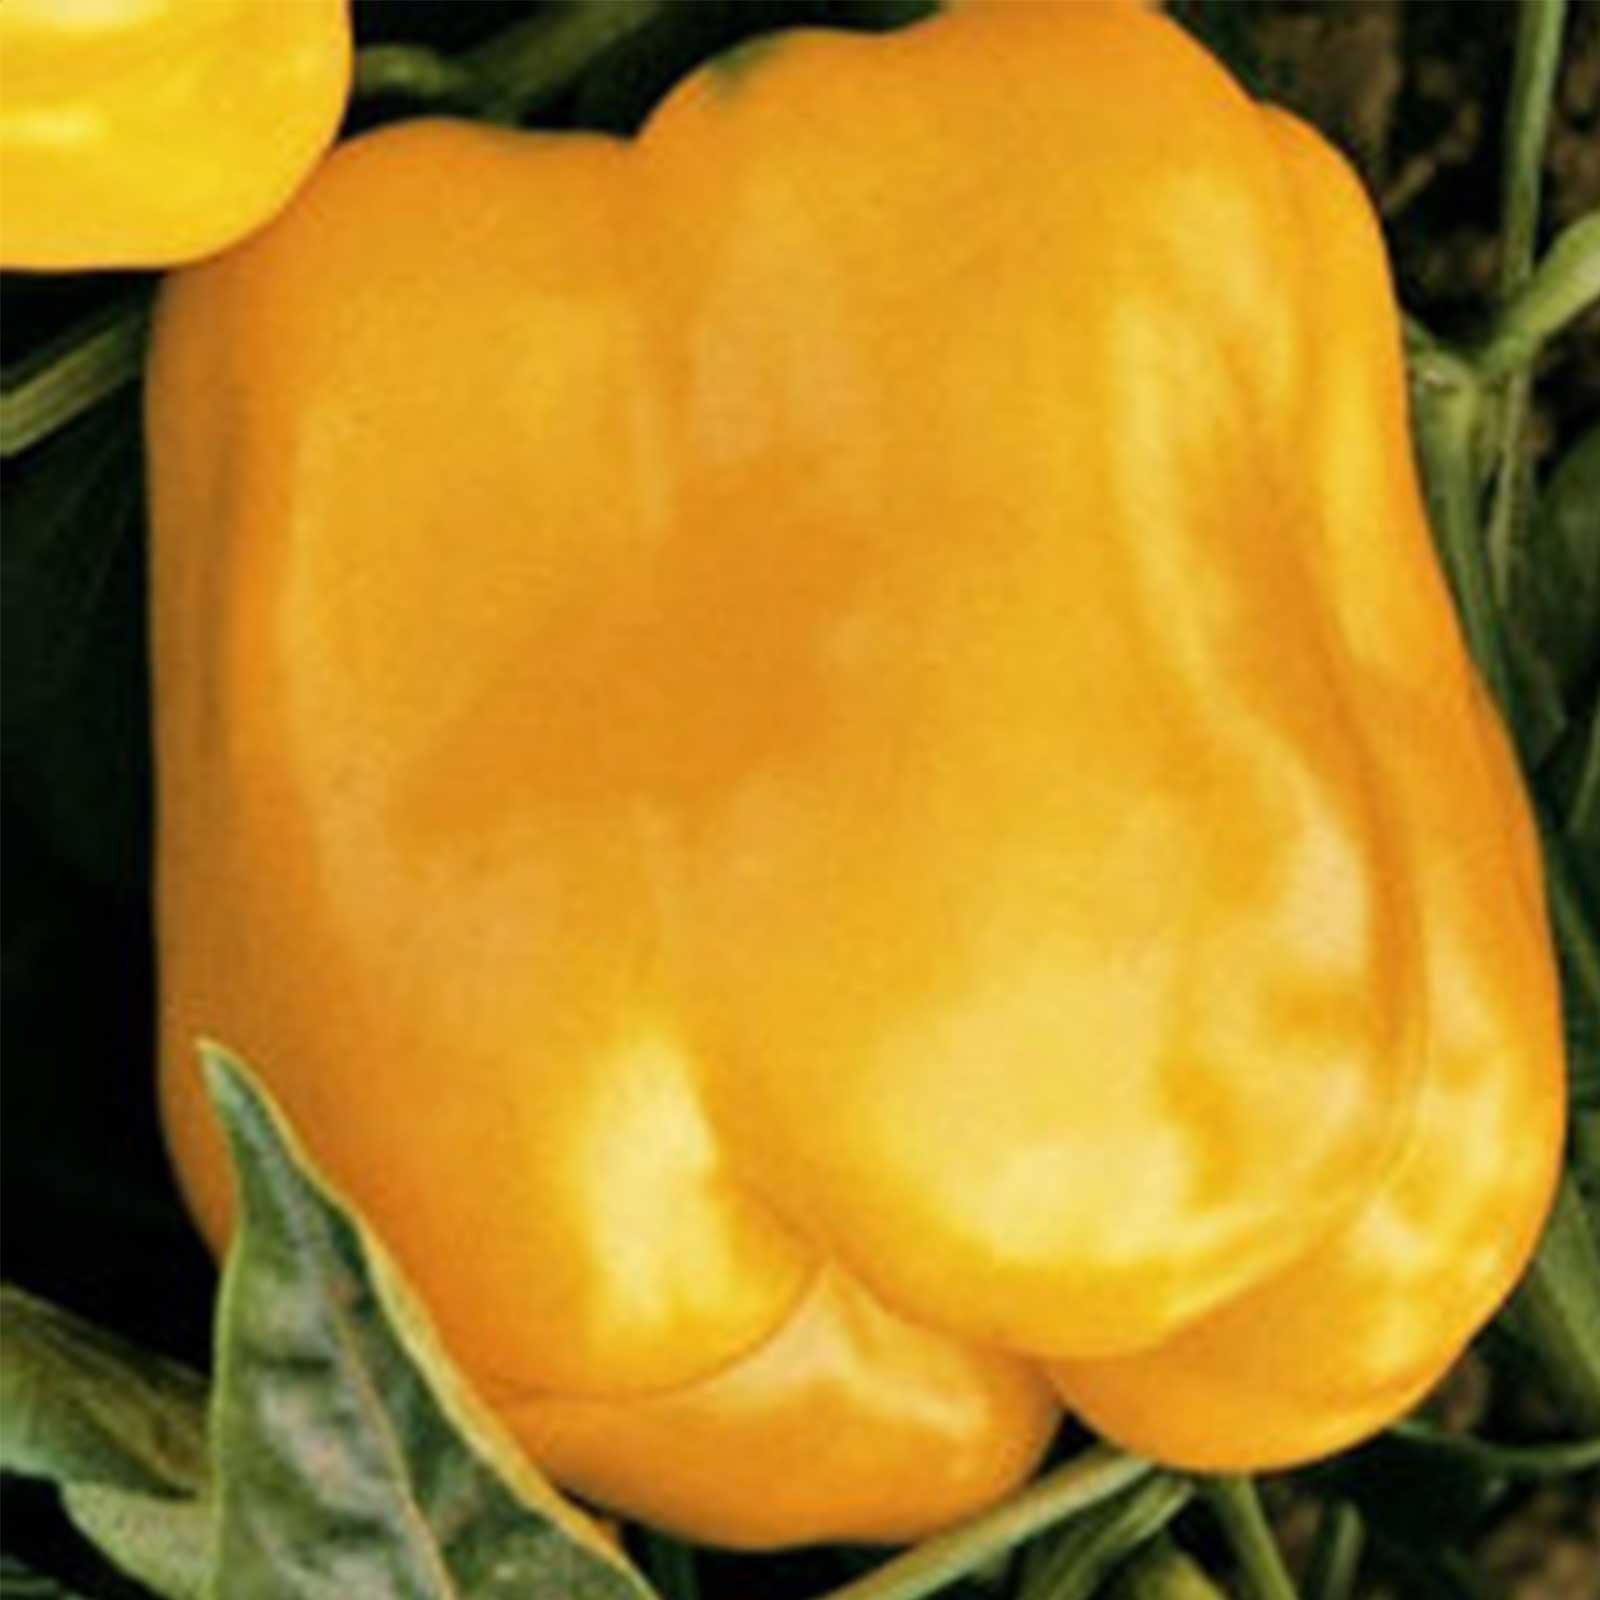 Golden Cal Wonder - Sweet Pepper Garden Seeds - 1 Lb - Non-GMO, Heirloom - California Wonder Bell Peppers - Golden Orange - Vegetable Gardening Seed